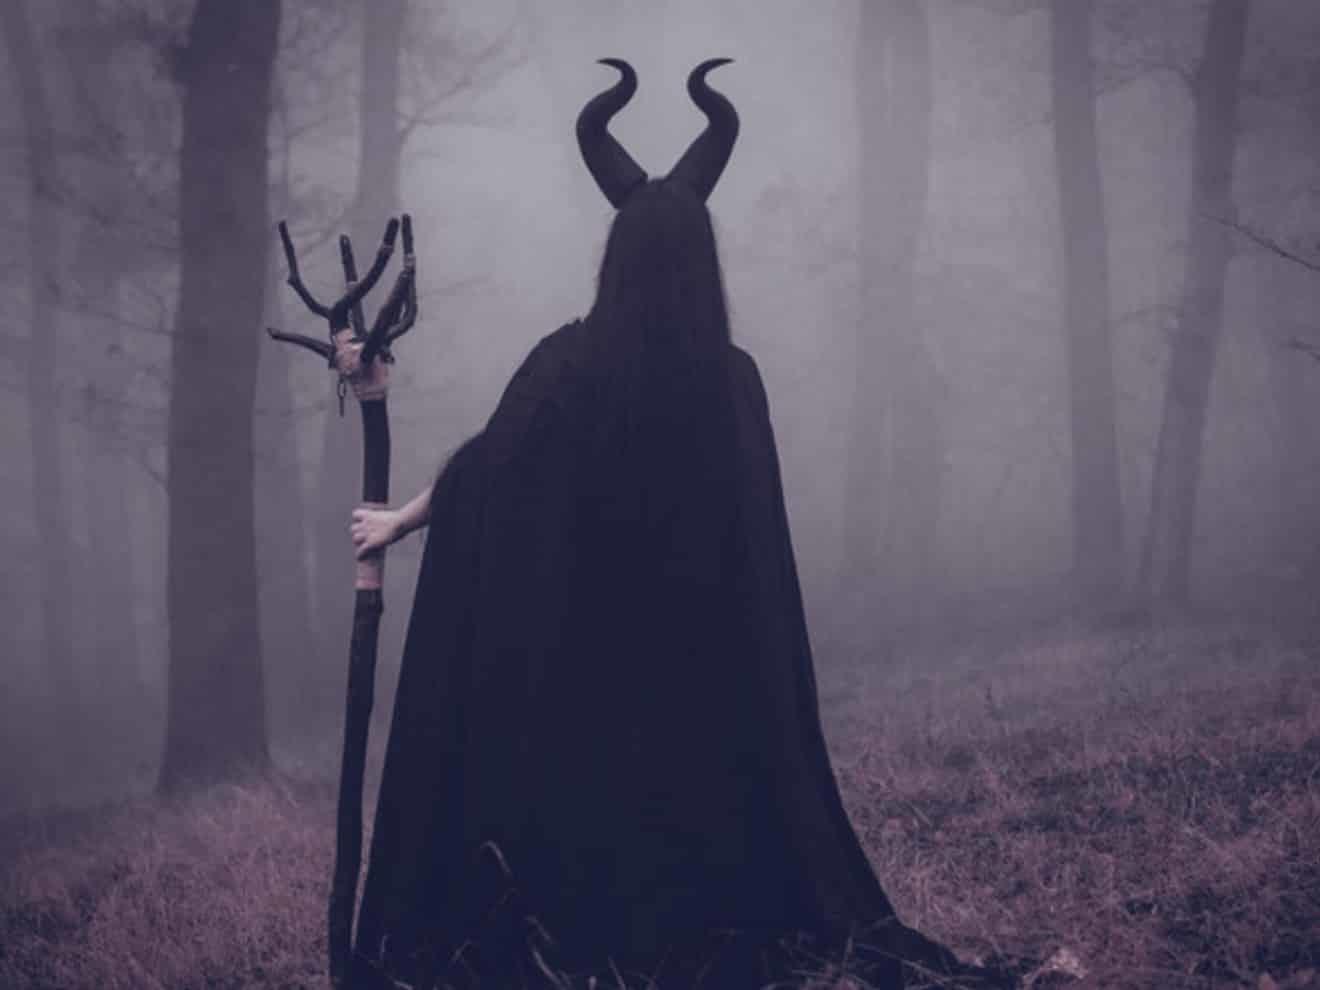 The Devil And Exorcism In The Medieval Mindset